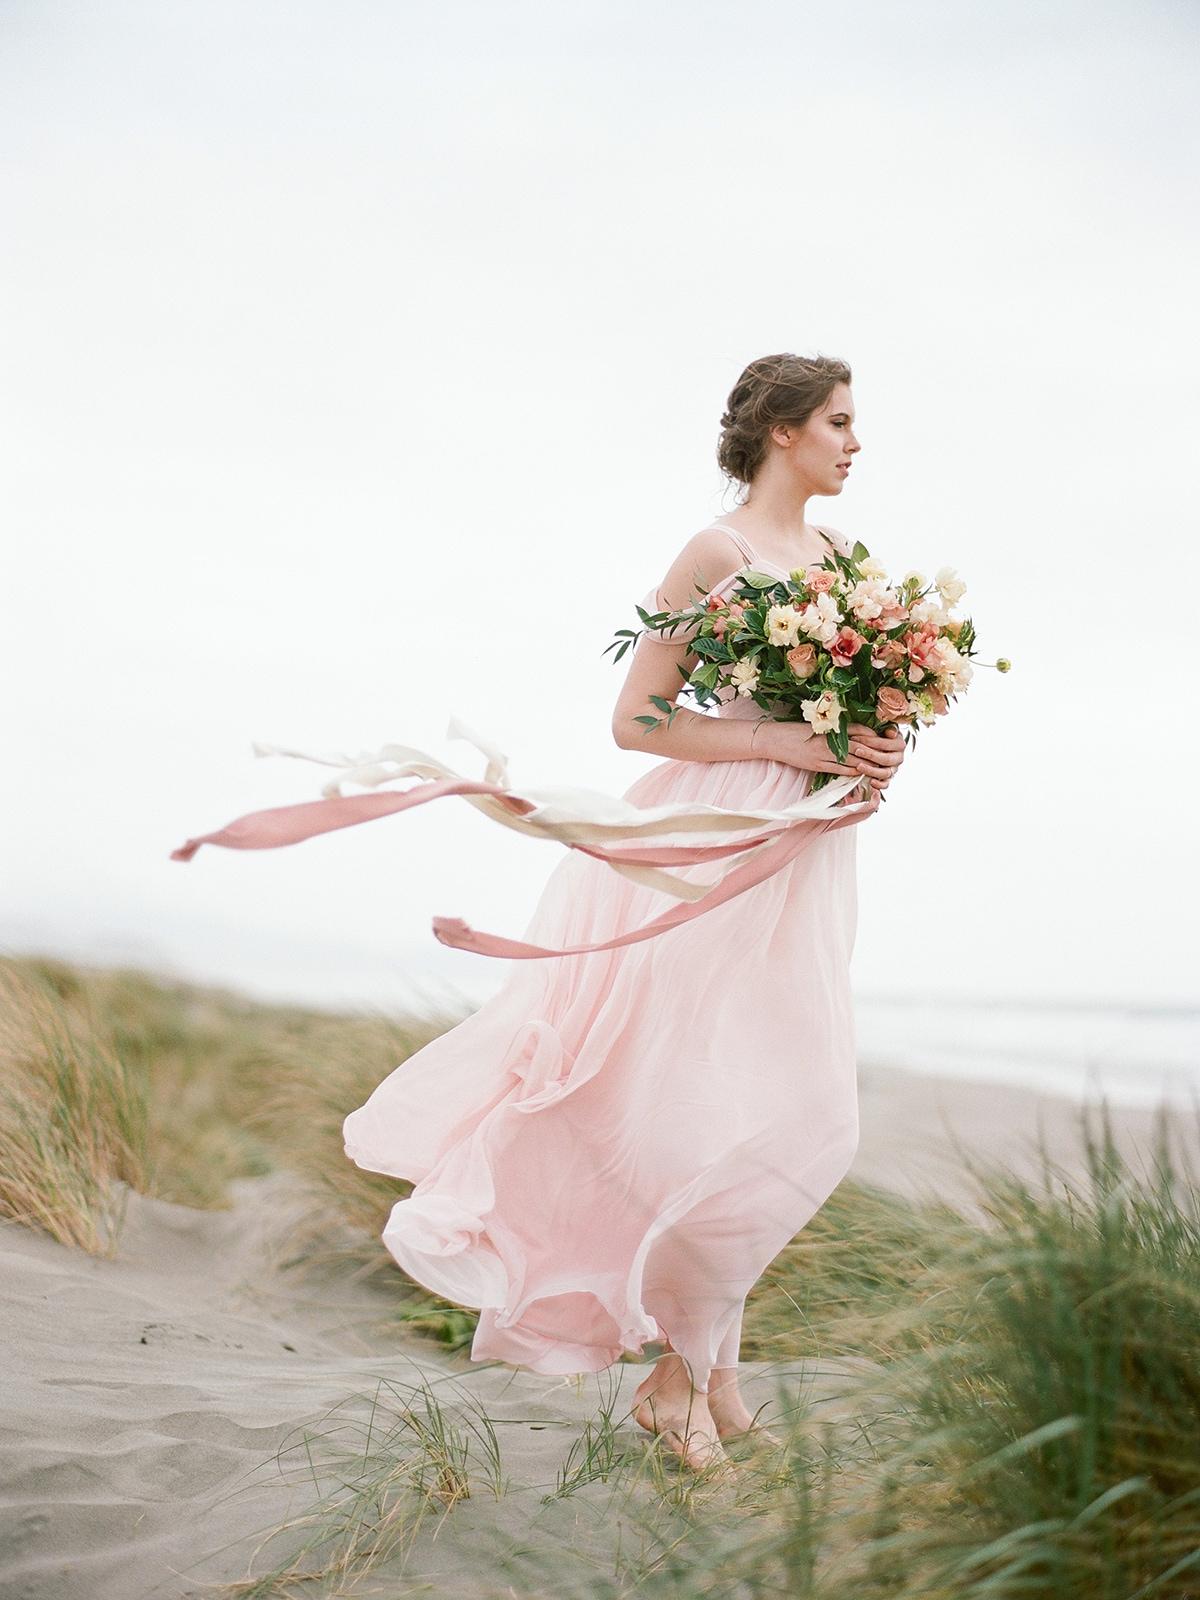 Winswept Mauve Beachside California Bridal Inspiration | Shotgunning for Love Letters